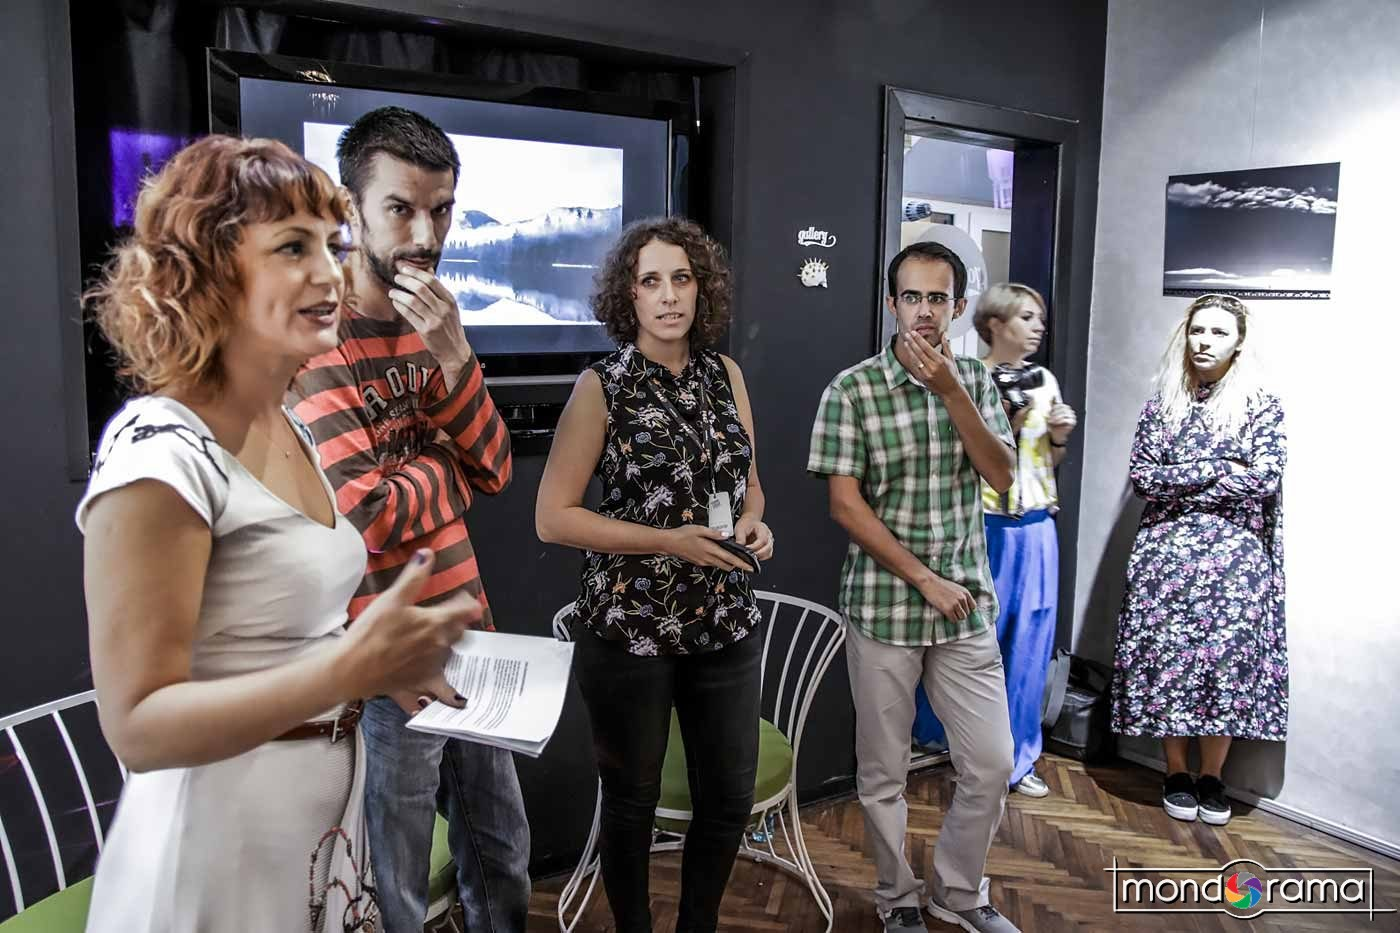 © Cristian Crisbasan. O parte din echipa BPW 2017, de la stanga la dreapta: Mirela Momanu (fondator), Cristian Bassa (co-organizator), Cristina Tinta (fondator), Andrei Baciu (invitat).